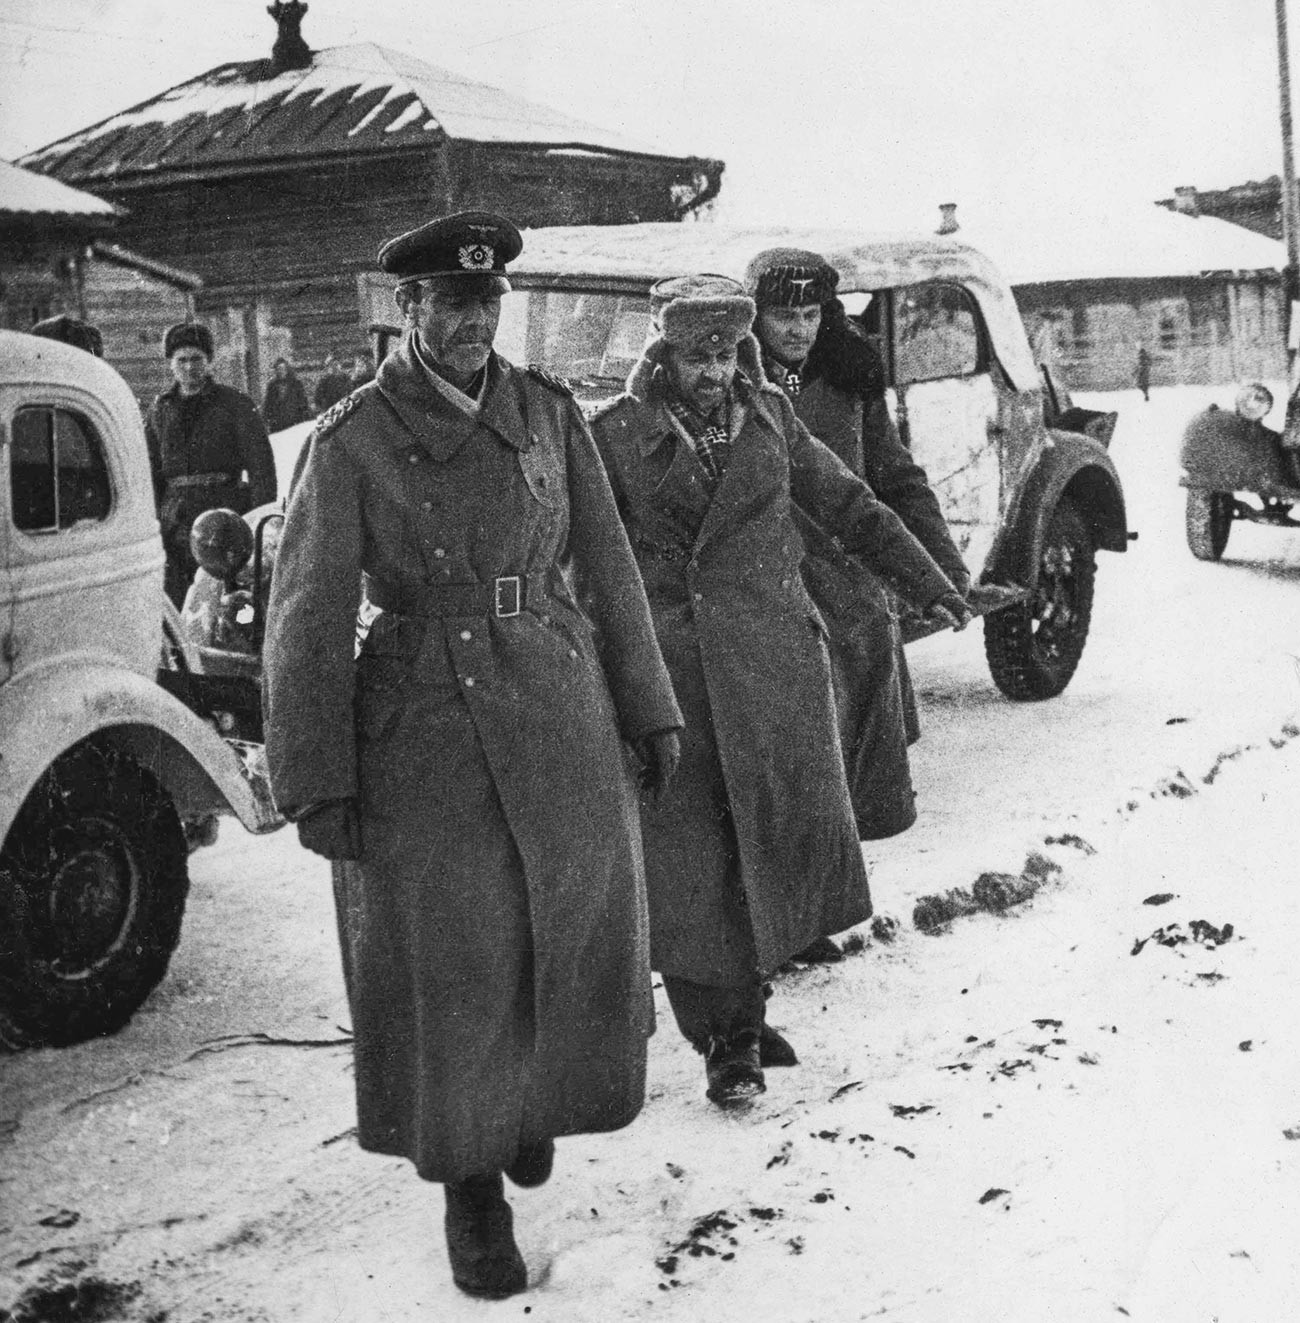 Field-Marshal Friedrich Paulus and his staff taken prisoner in Stalingrad.